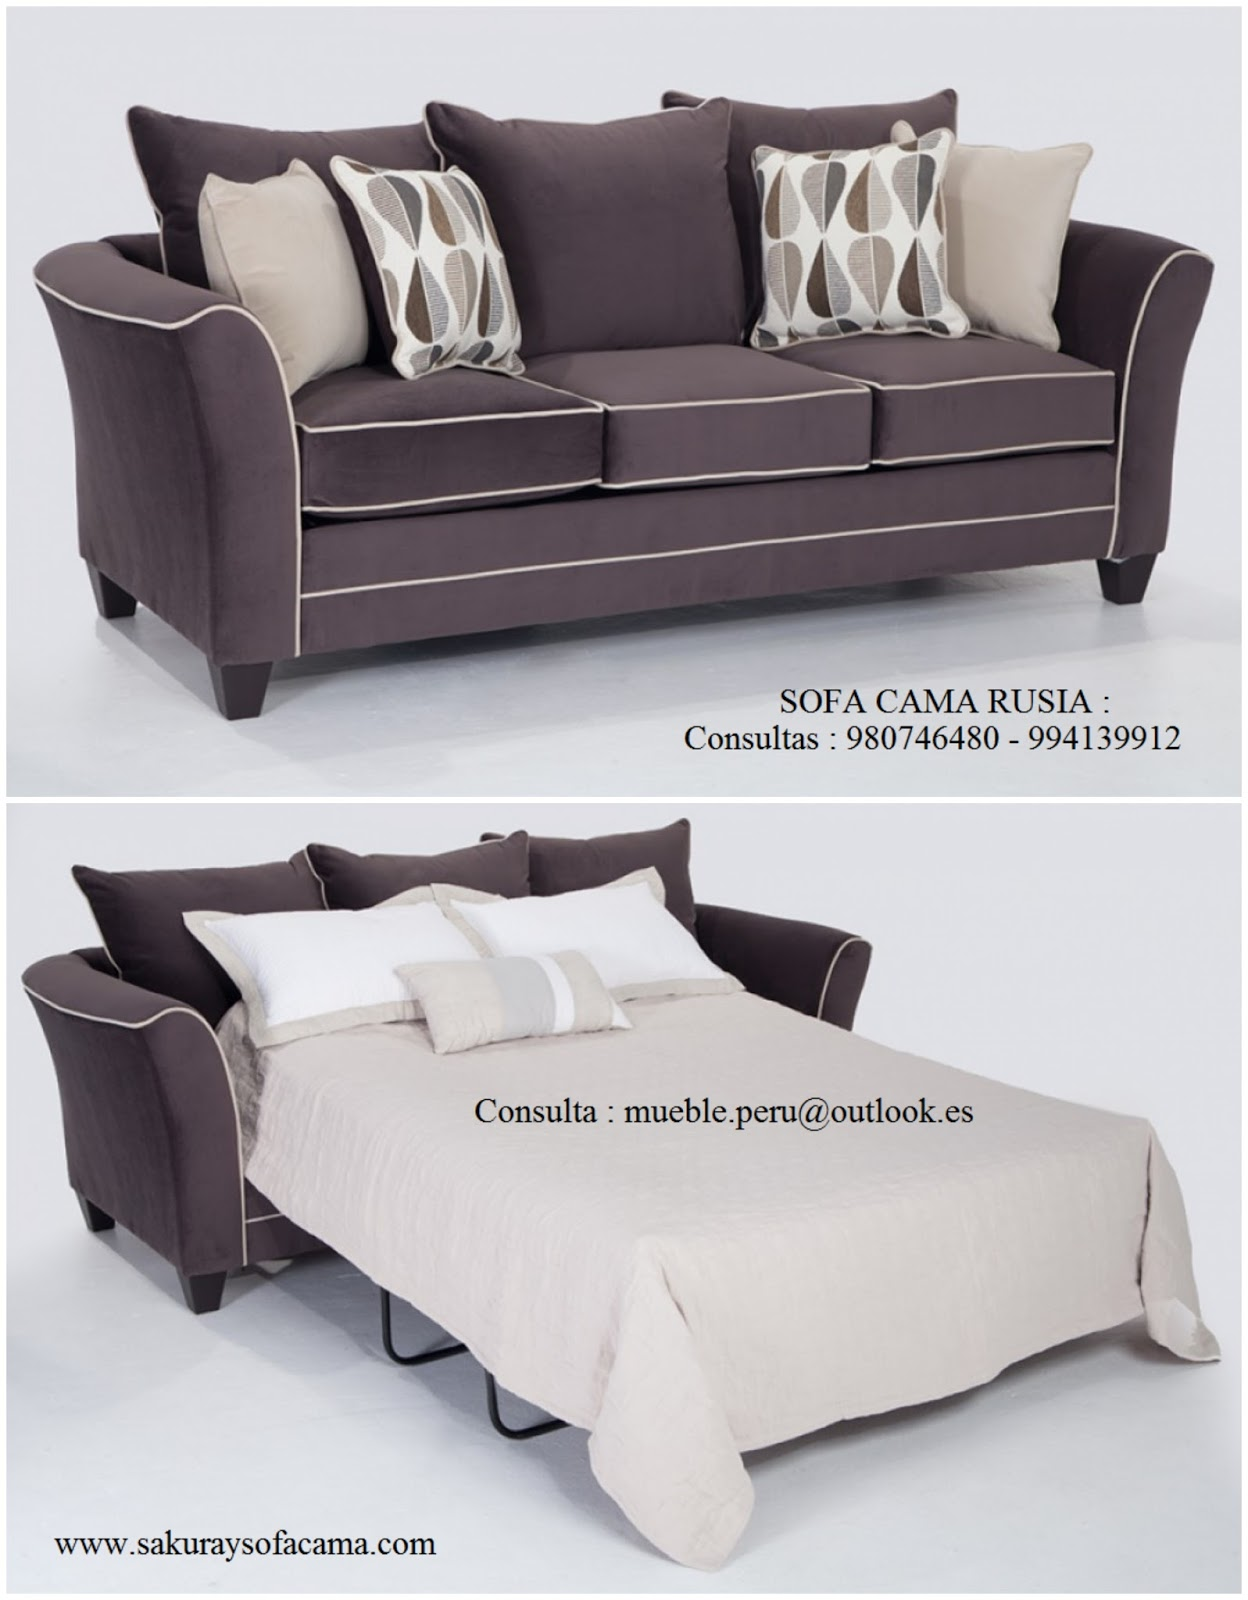 Mueble peru sakuray sofa cama rusia - Mueble sofa cama ...